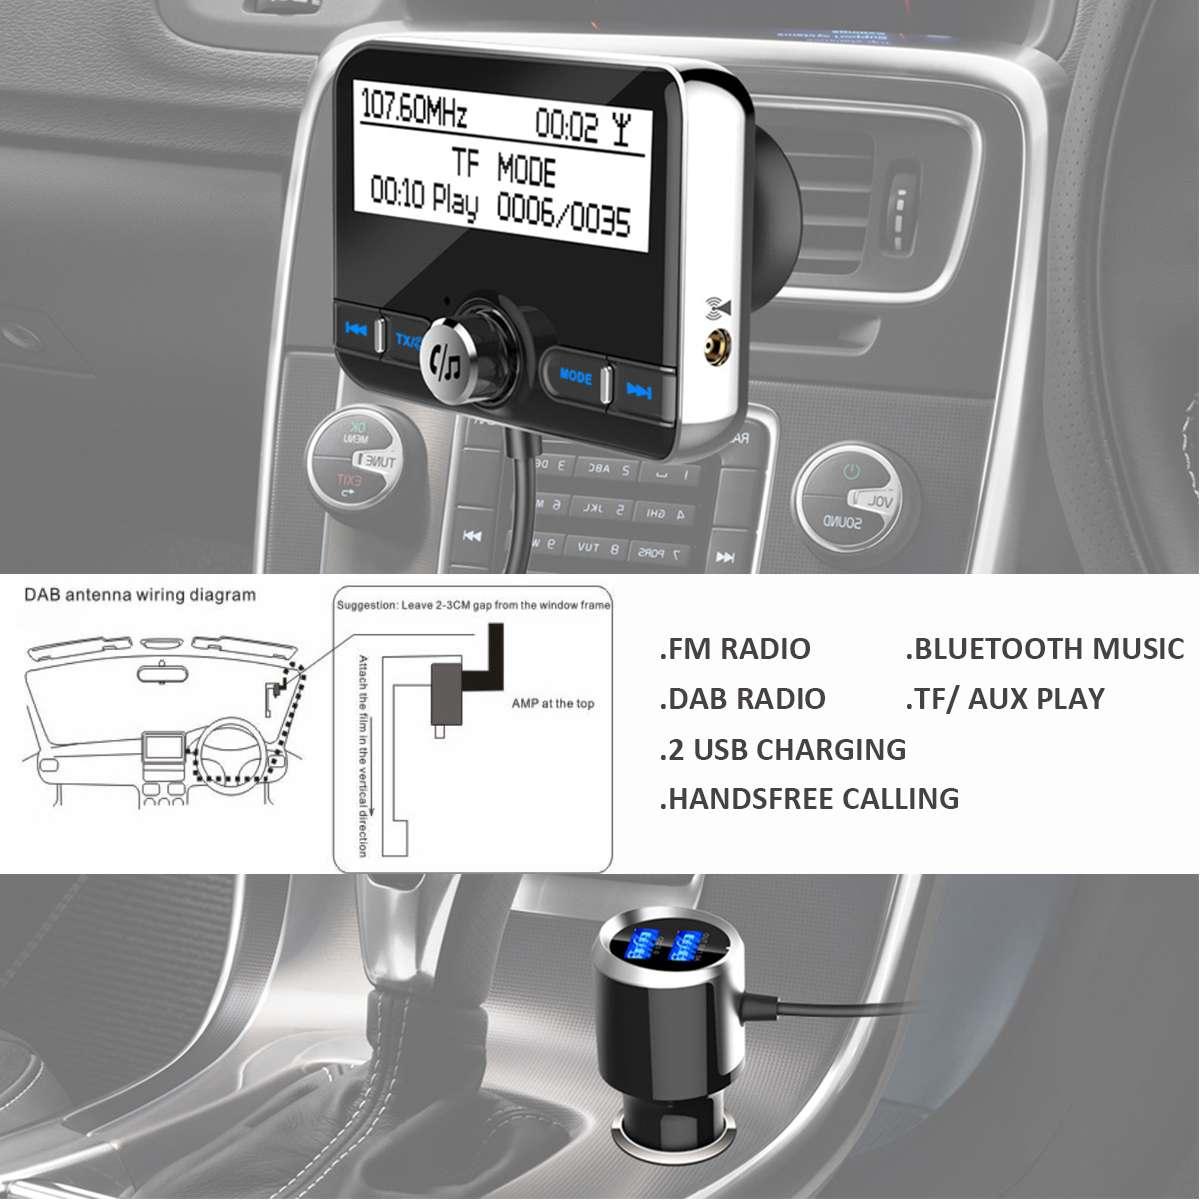 Car DAB Radio Receiver Tuner USB Adapter bluetooth Car Transmitter TF/AUX  Antenna LCD Display Digital Radio Handsfree Calling